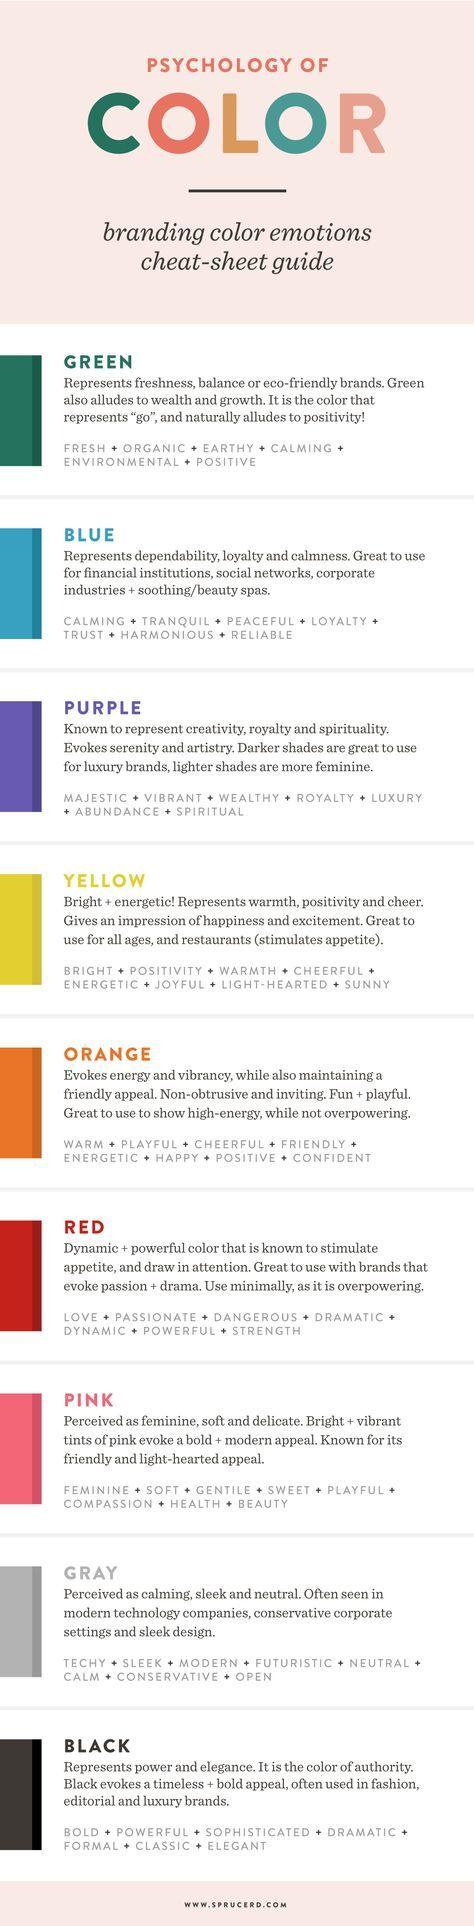 Psychology of Color in Branding | Spruce Rd. #branding #color #psychology